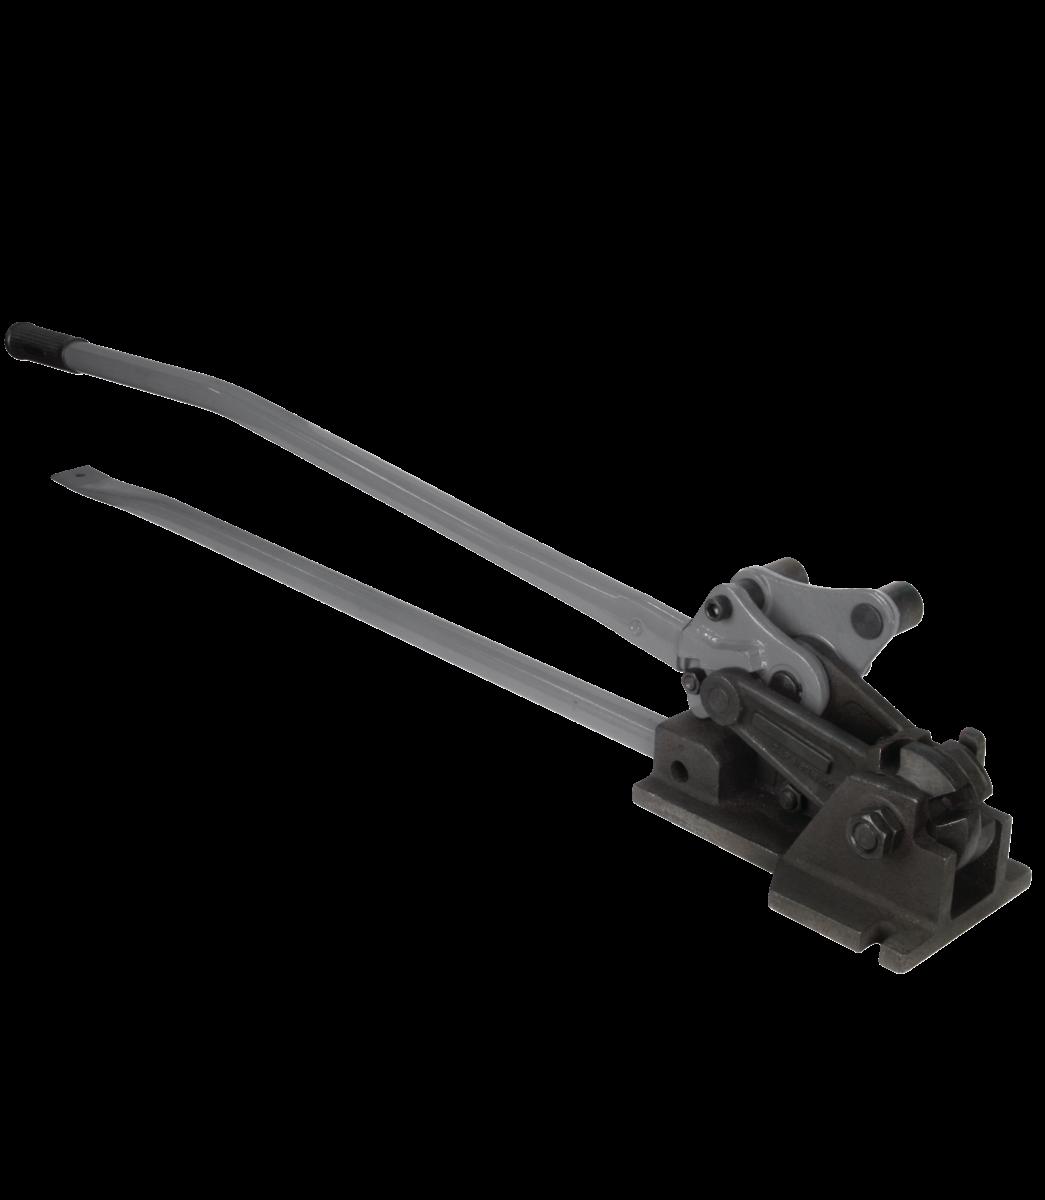 RCB-25 Rebar Cutter